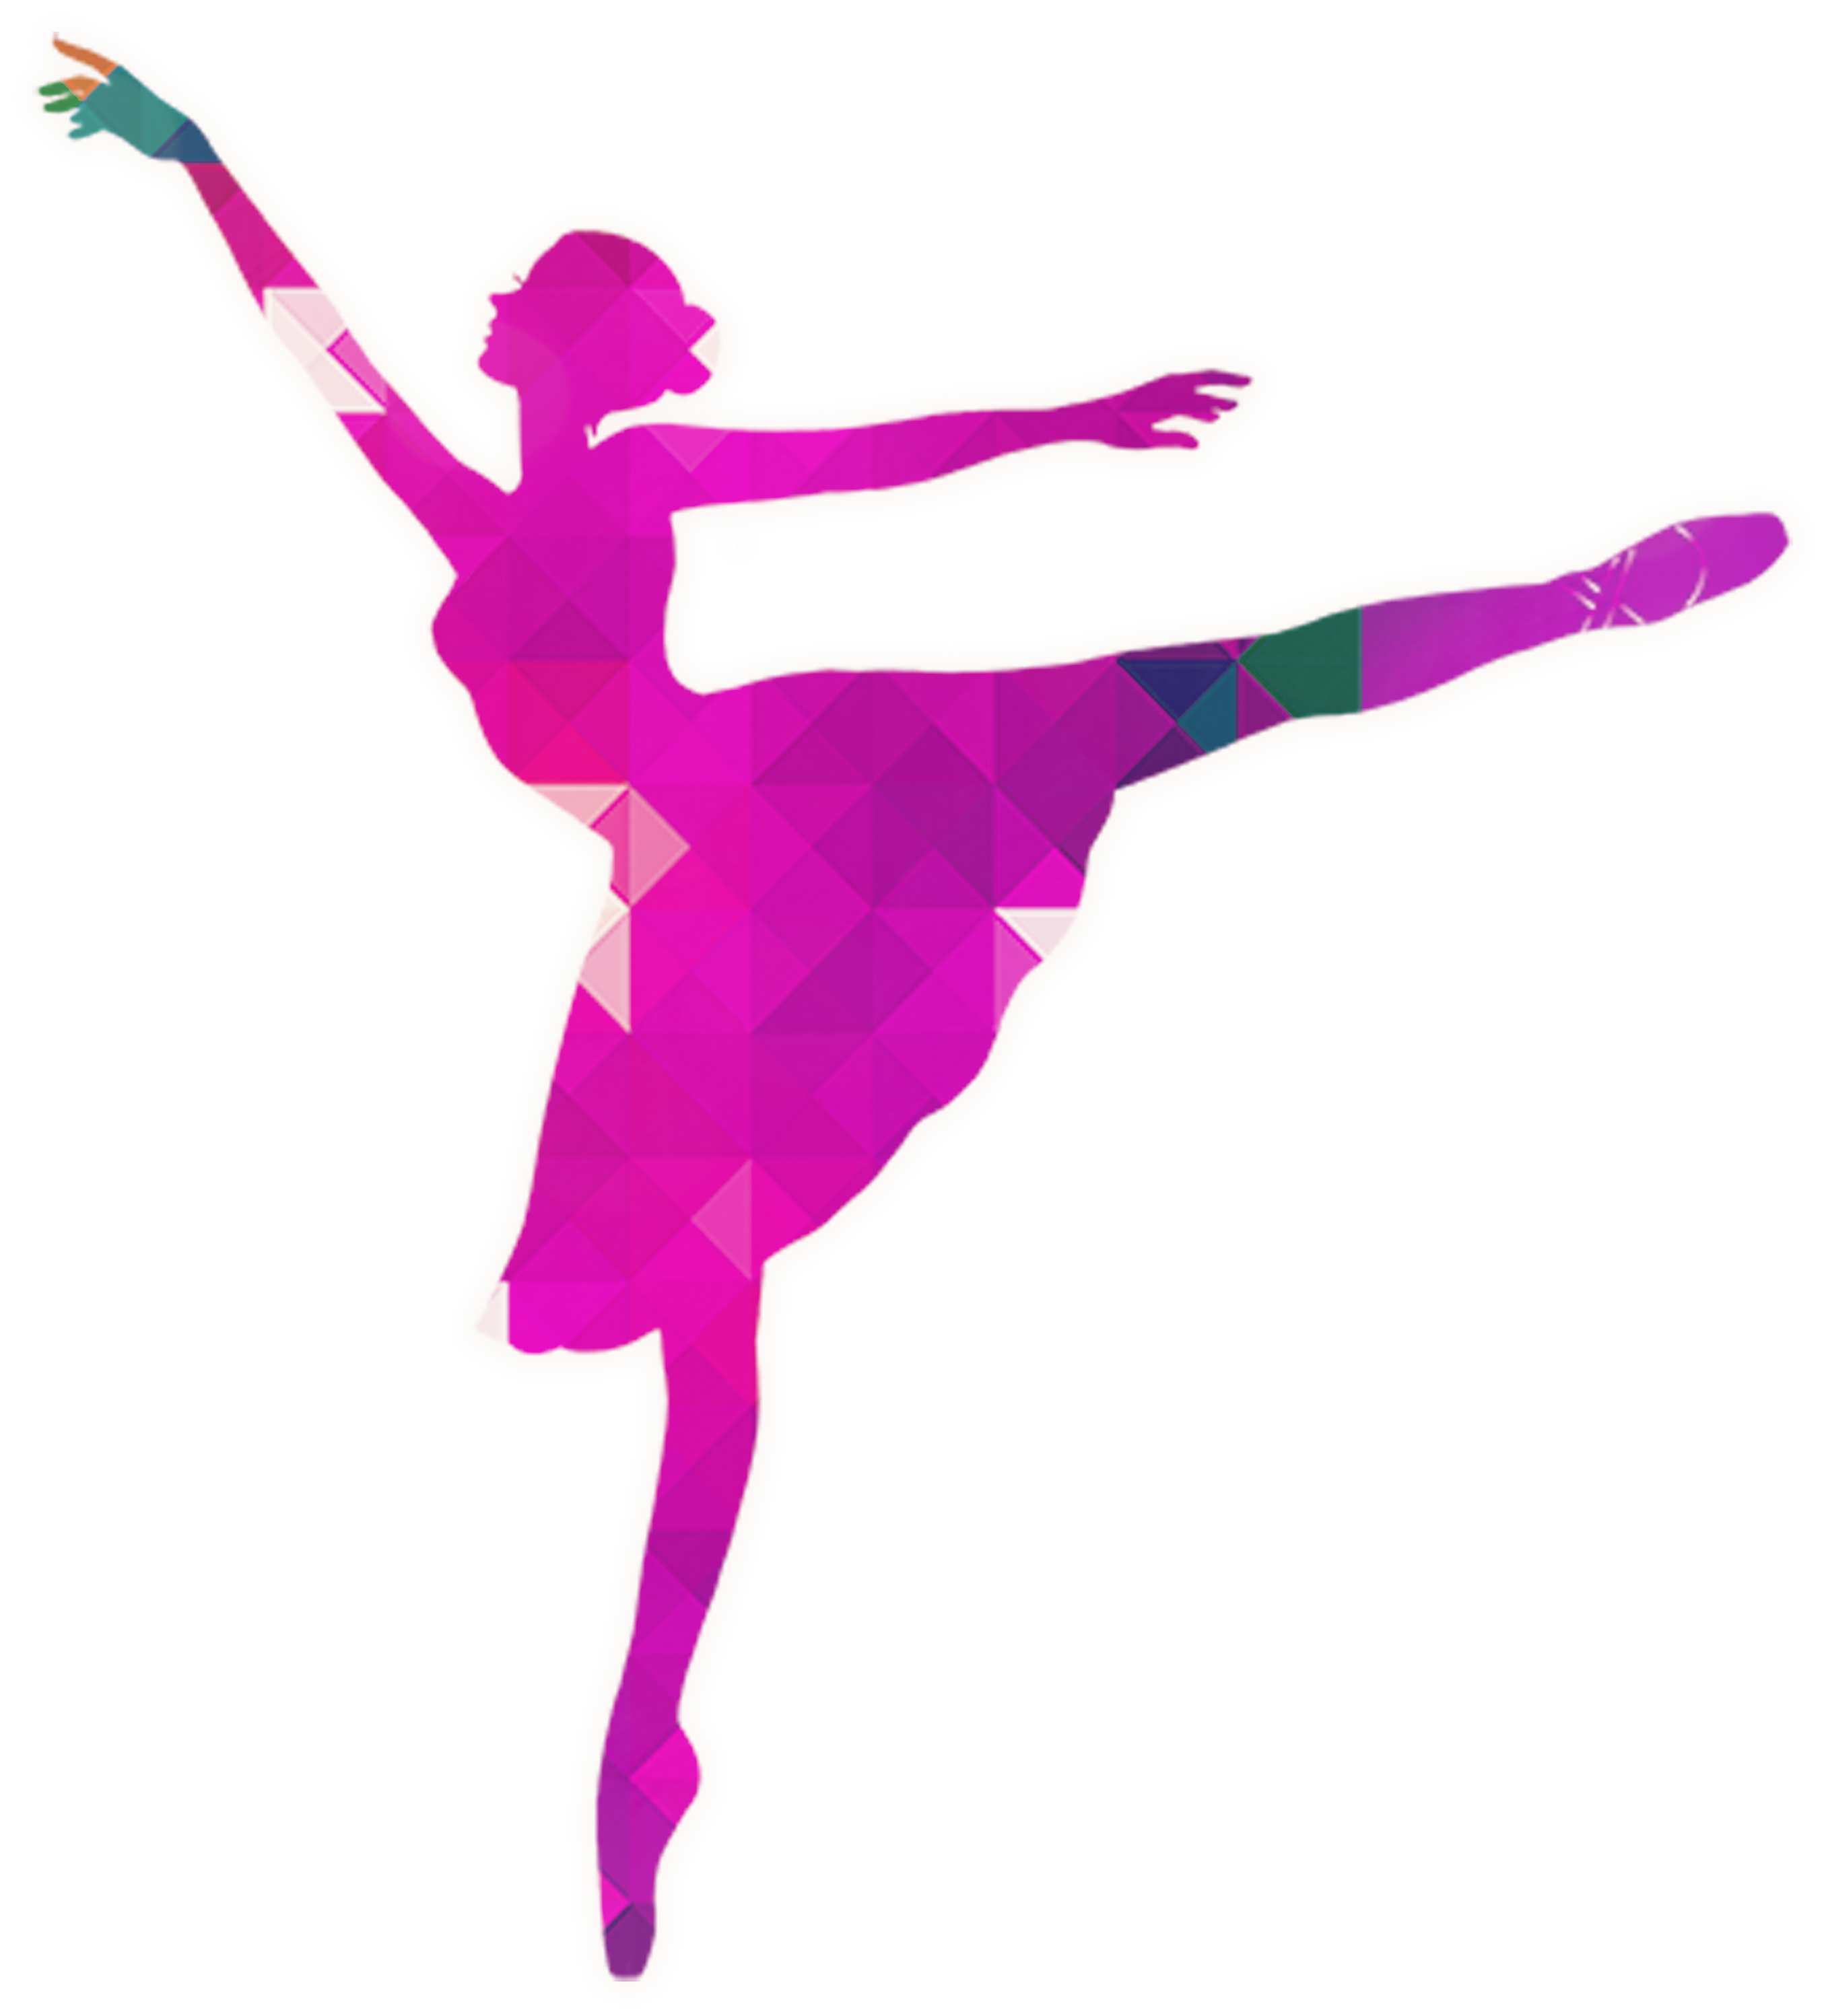 Ballet Dancer Silhouette Pink Ballet Dancer Silhouette Png Transparent Cartoon Jing Fm